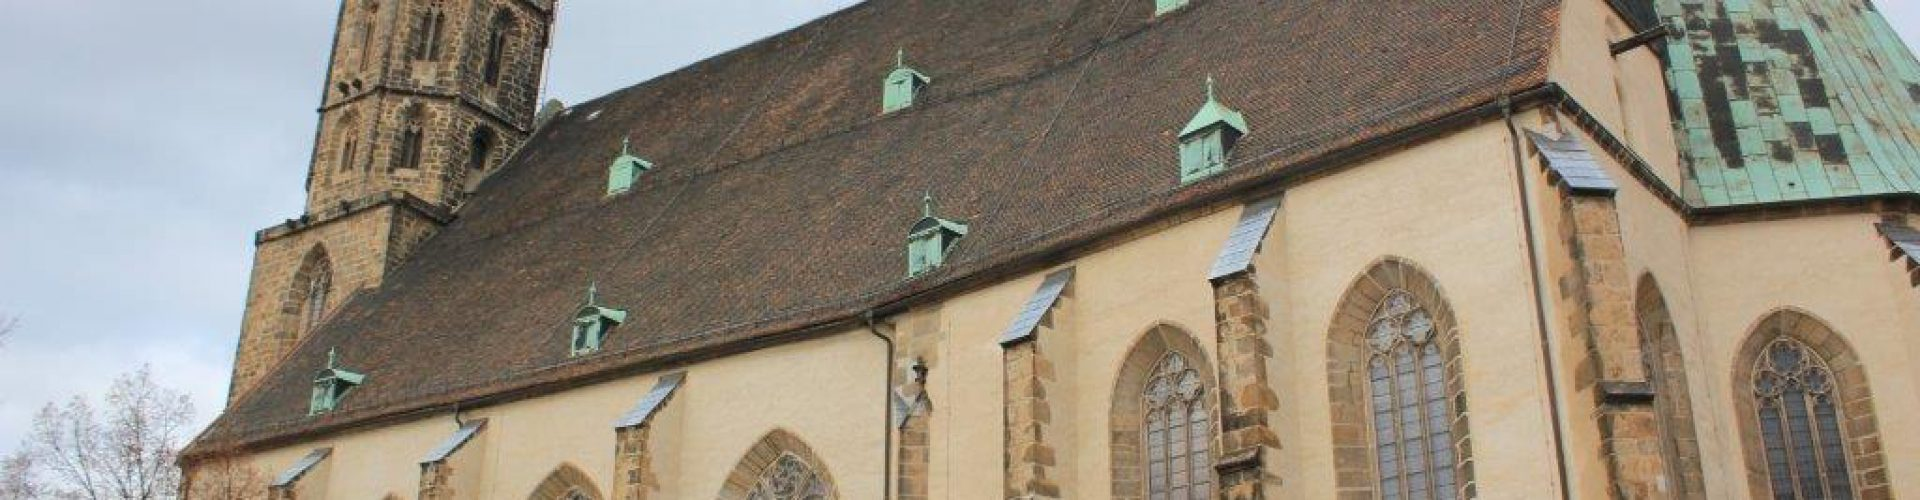 Dom_Bautzen-1920x500.jpg